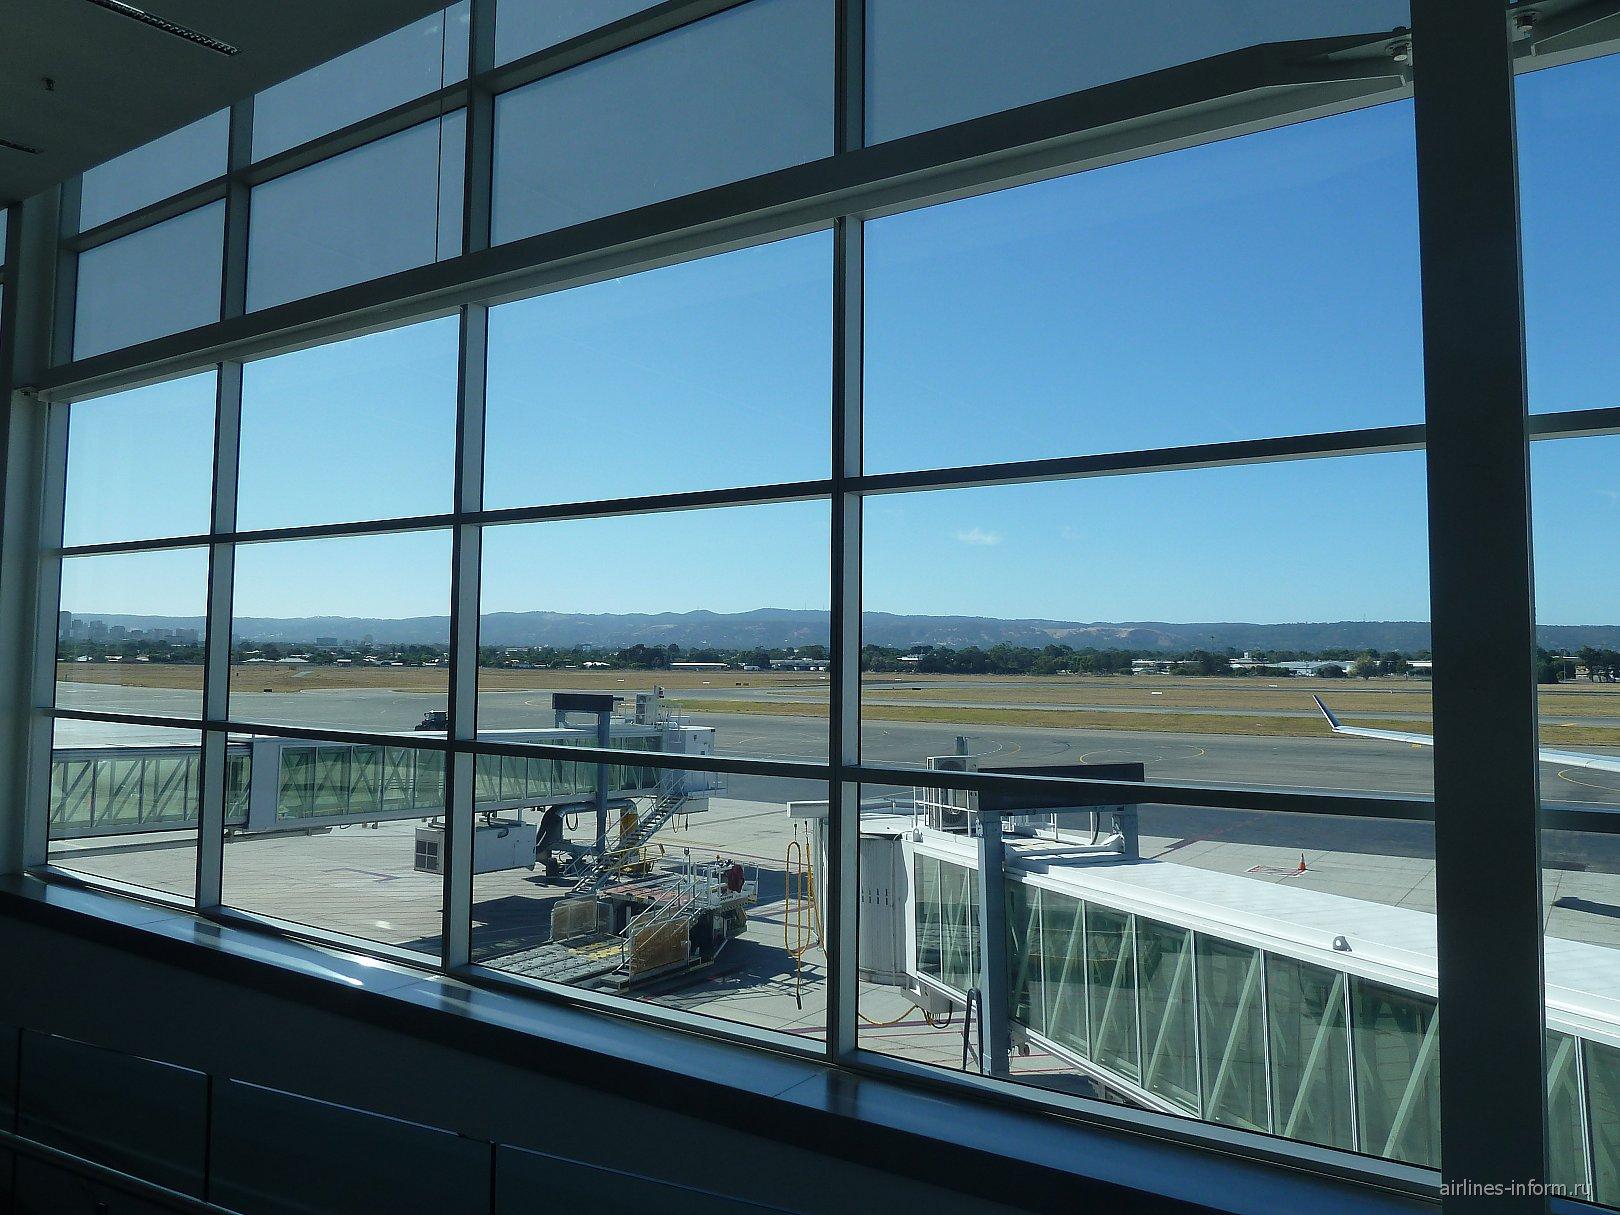 В аэропорту Аделаида